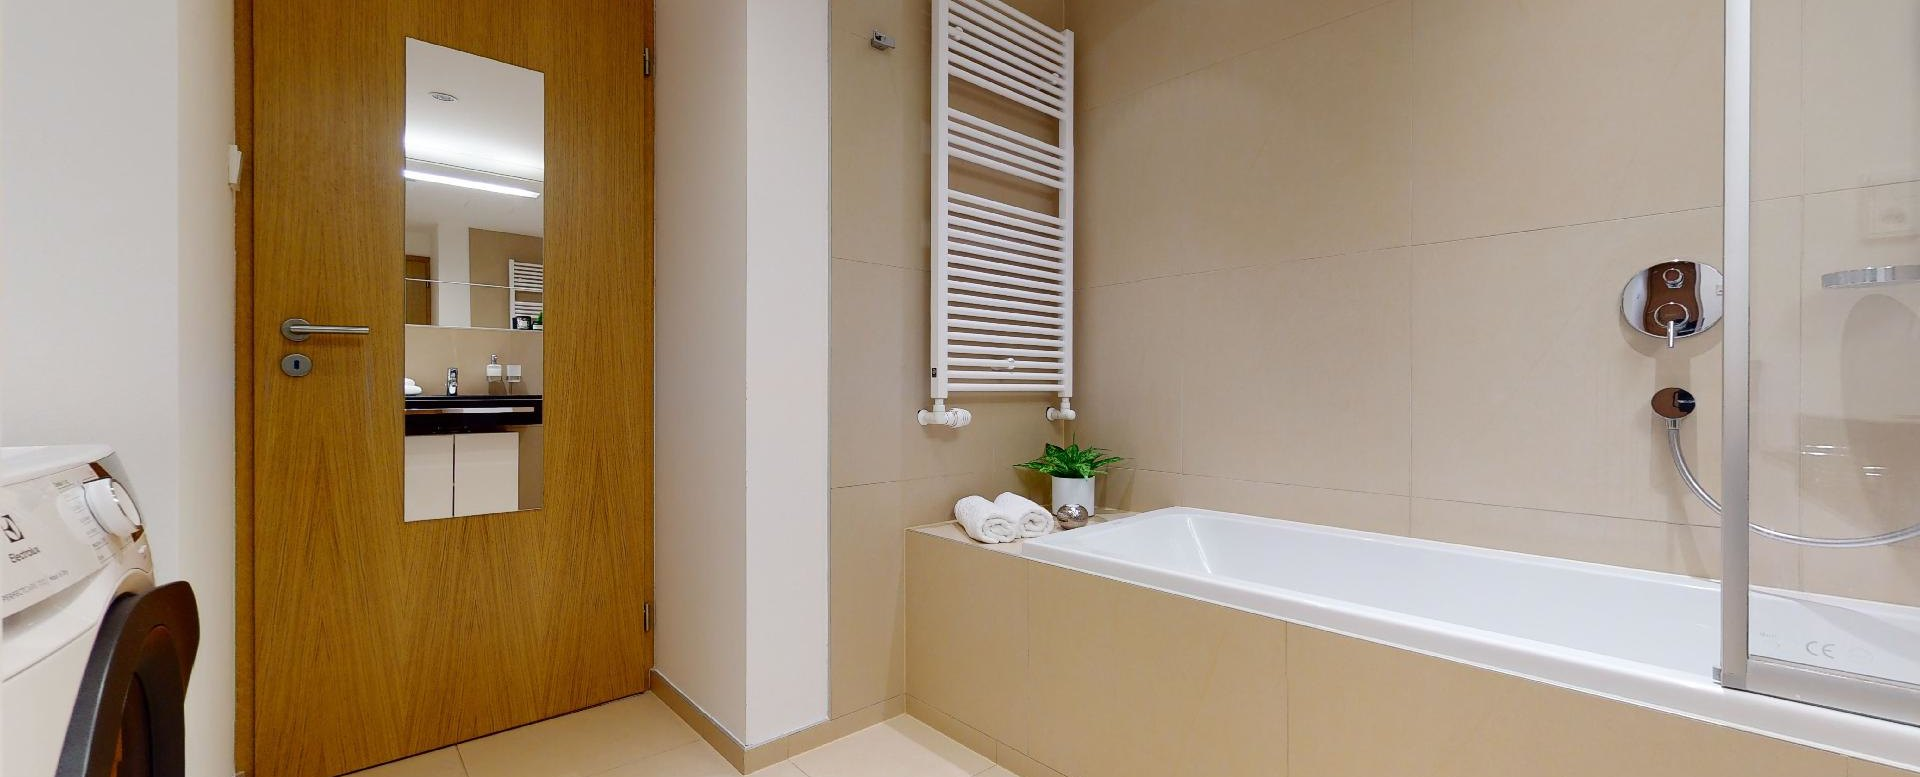 zrkadlo na dverách v kúpeľni